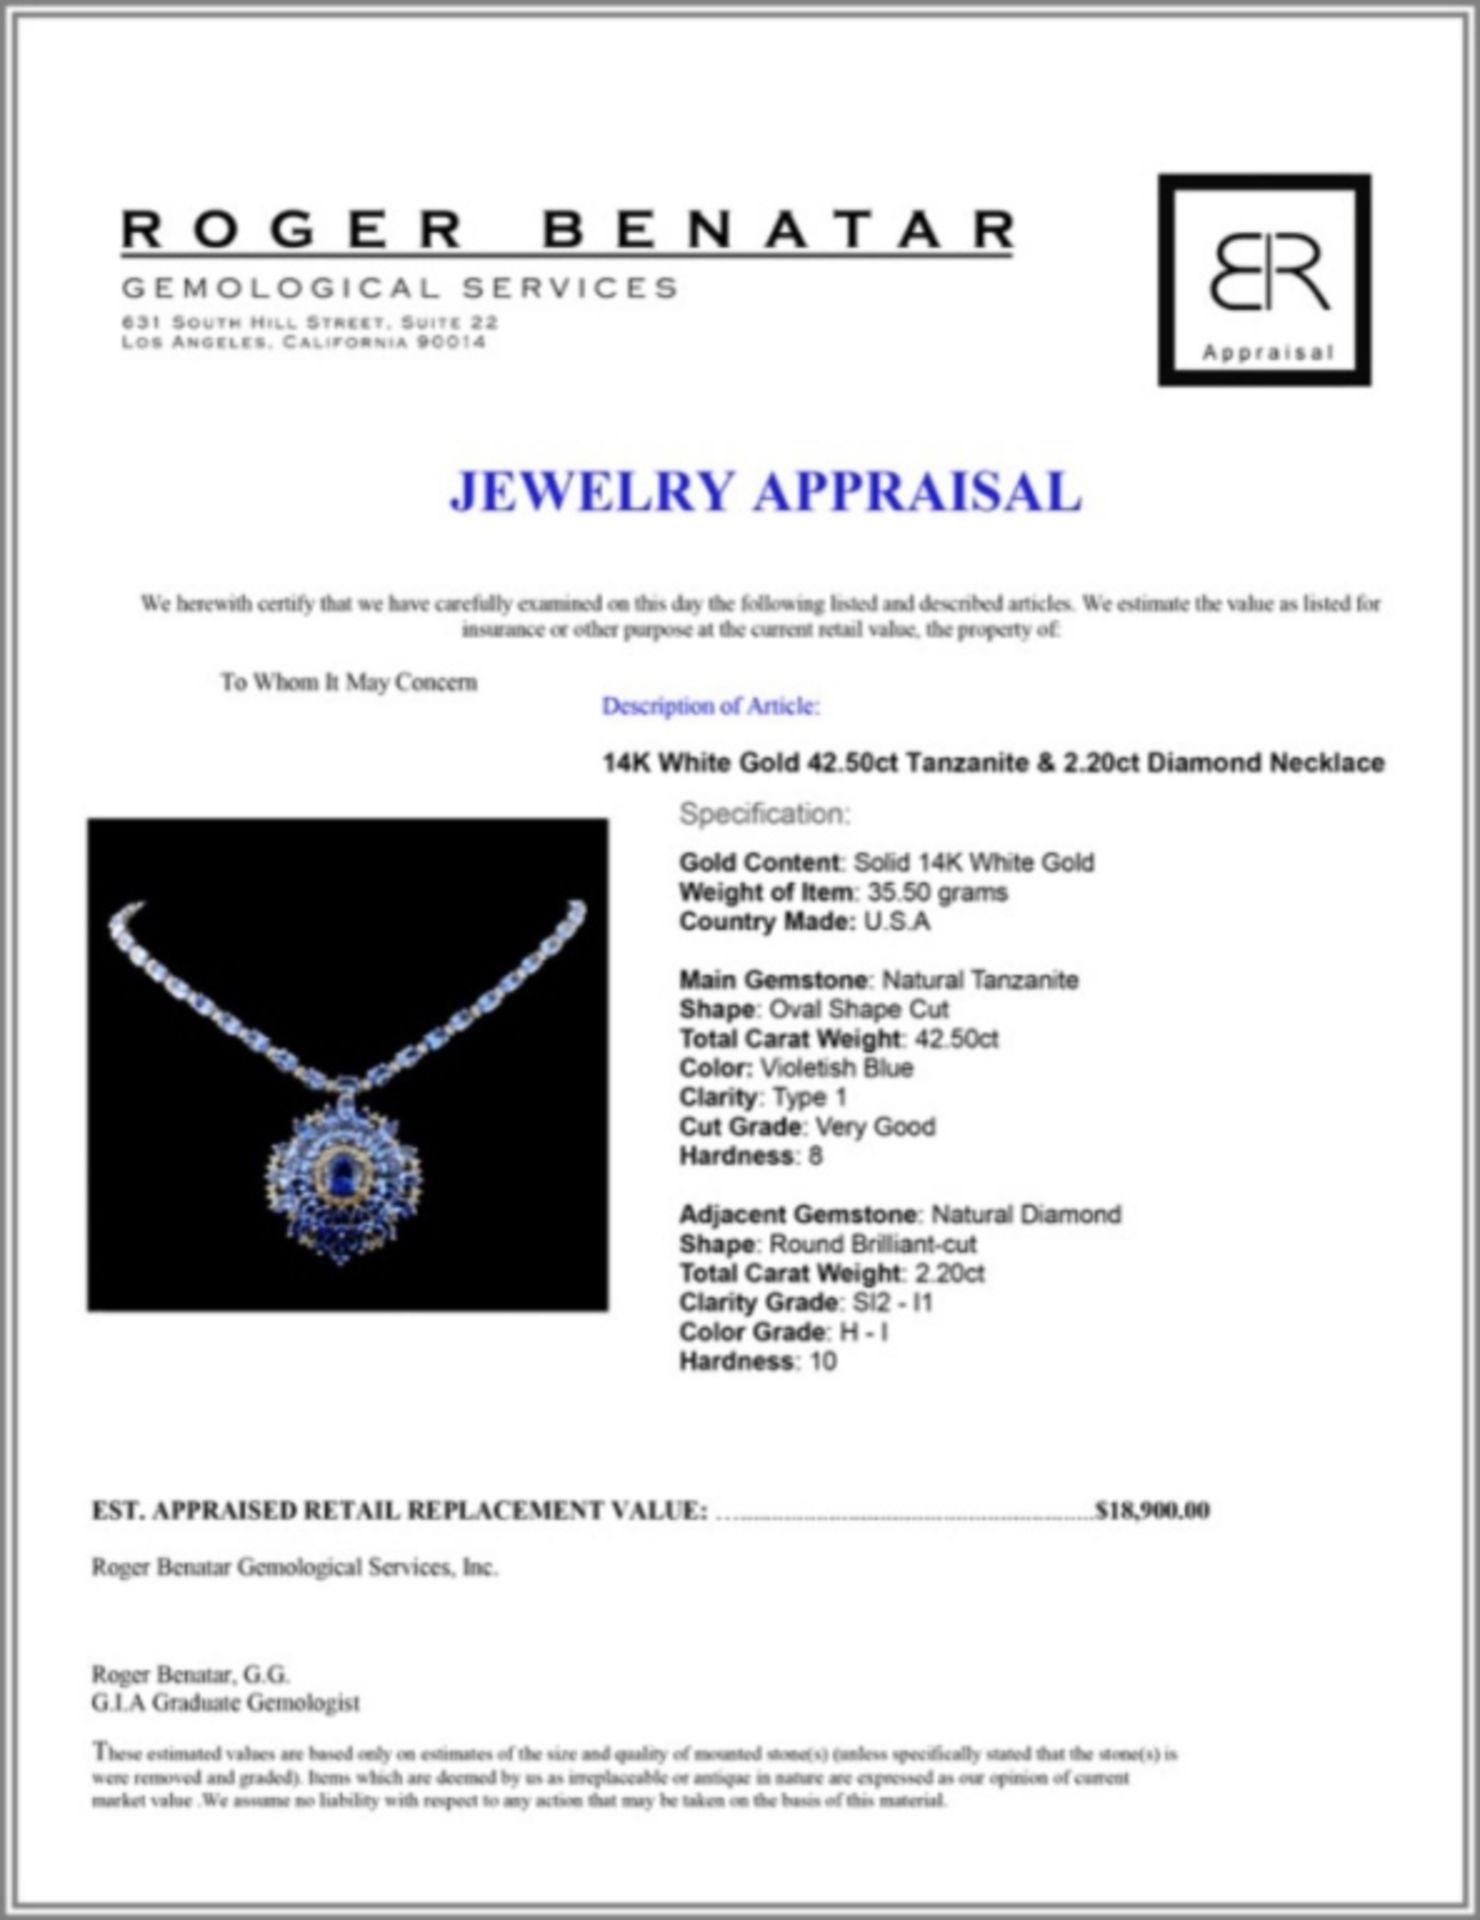 14K White Gold 42.50ct Tanzanite & 2.20ct Diamond - Image 3 of 3